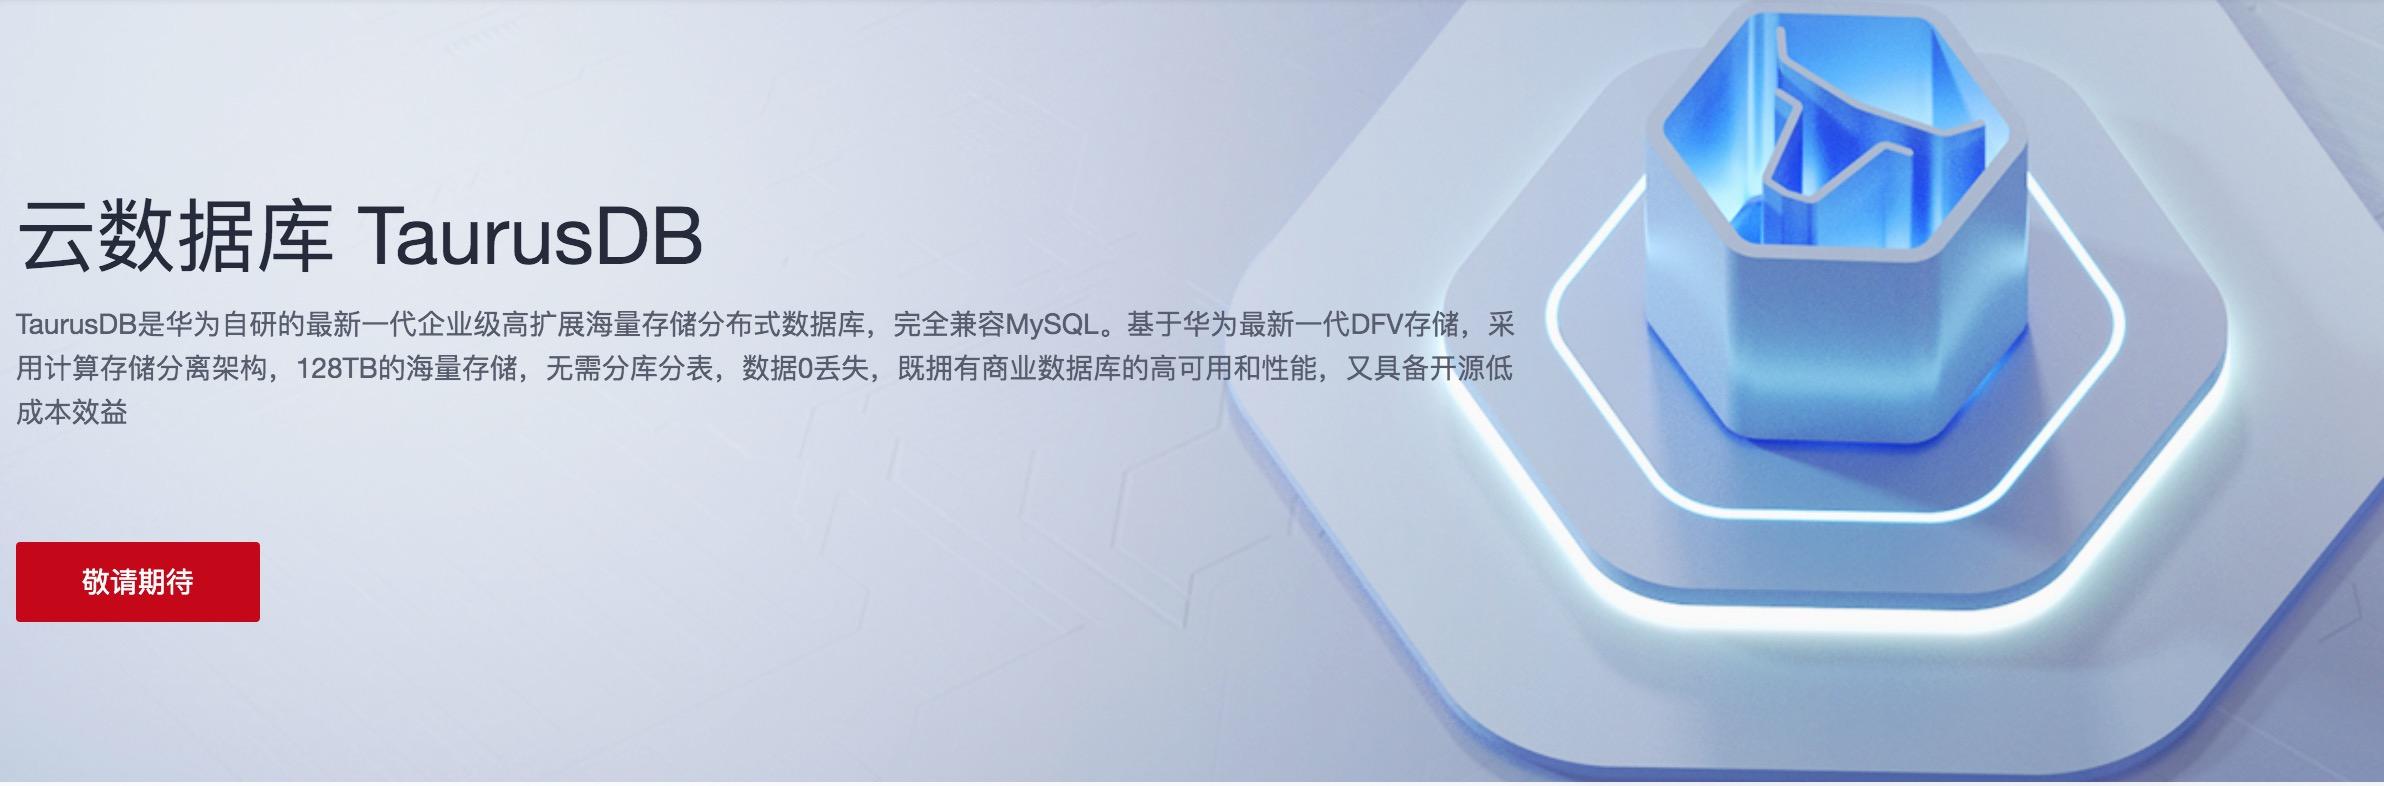 PIC 6.jpg